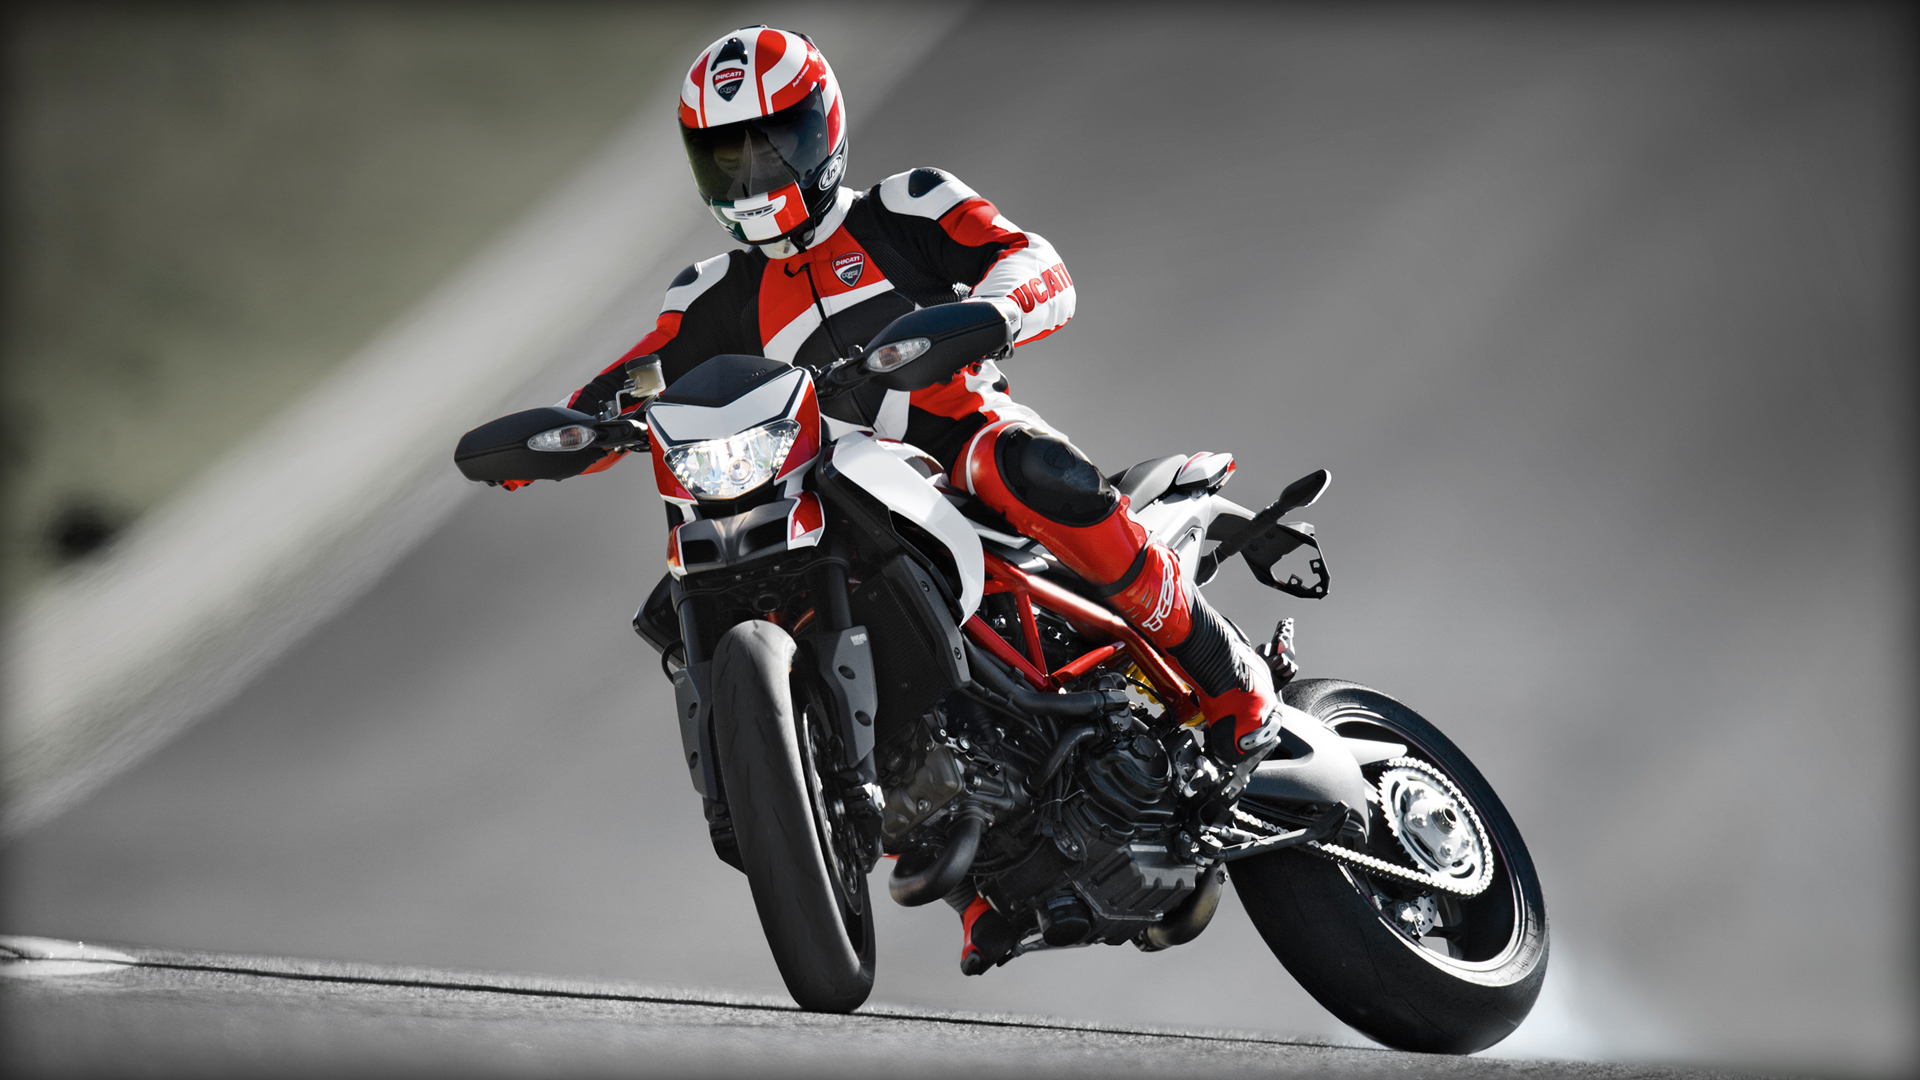 2014 Ducati HYPER MOTORARD 1100 EVO SP | Ducati Hypermotard SP